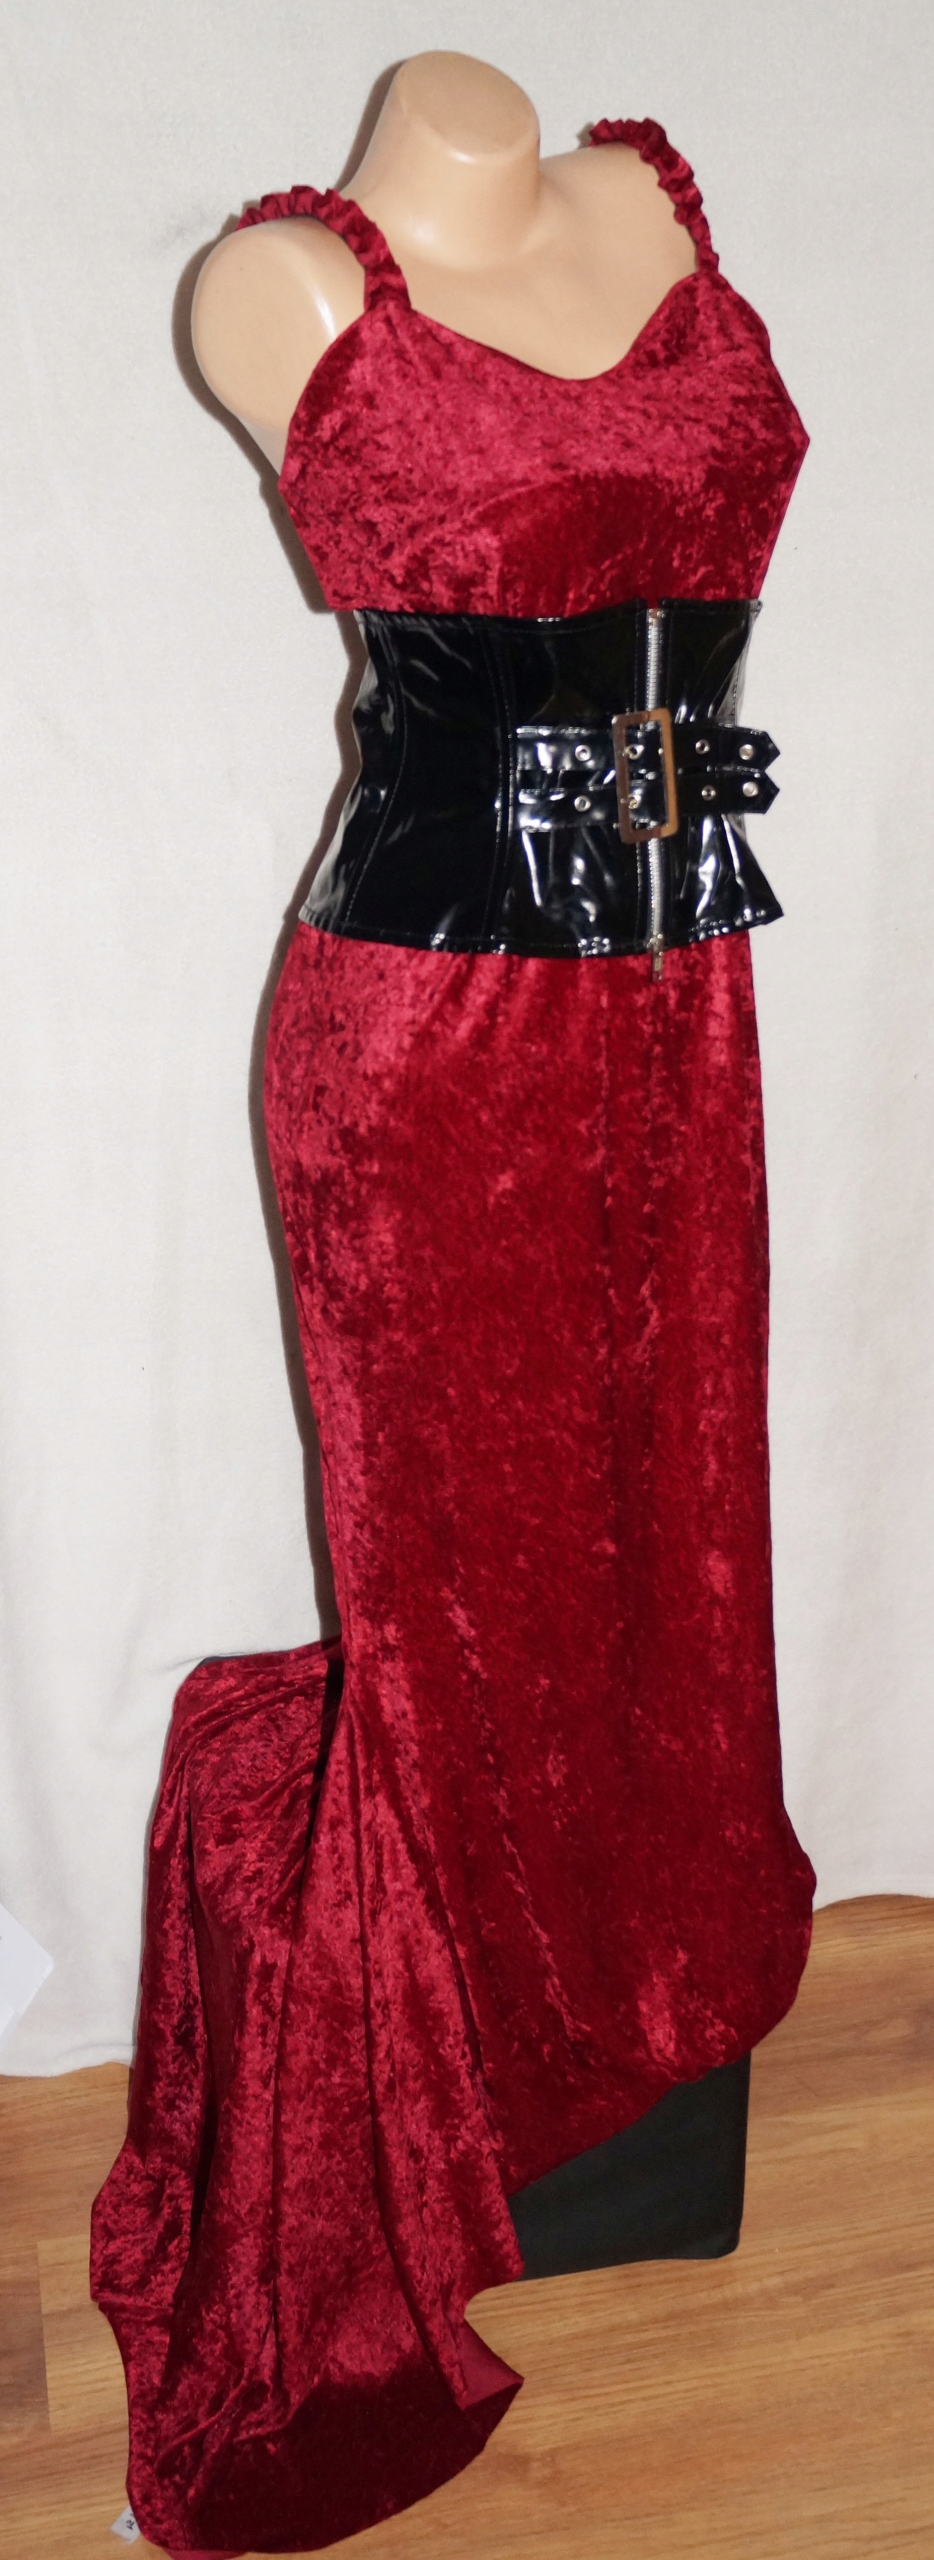 Sukienka Famme Fatale Dama Wampirzyca Goth M / L